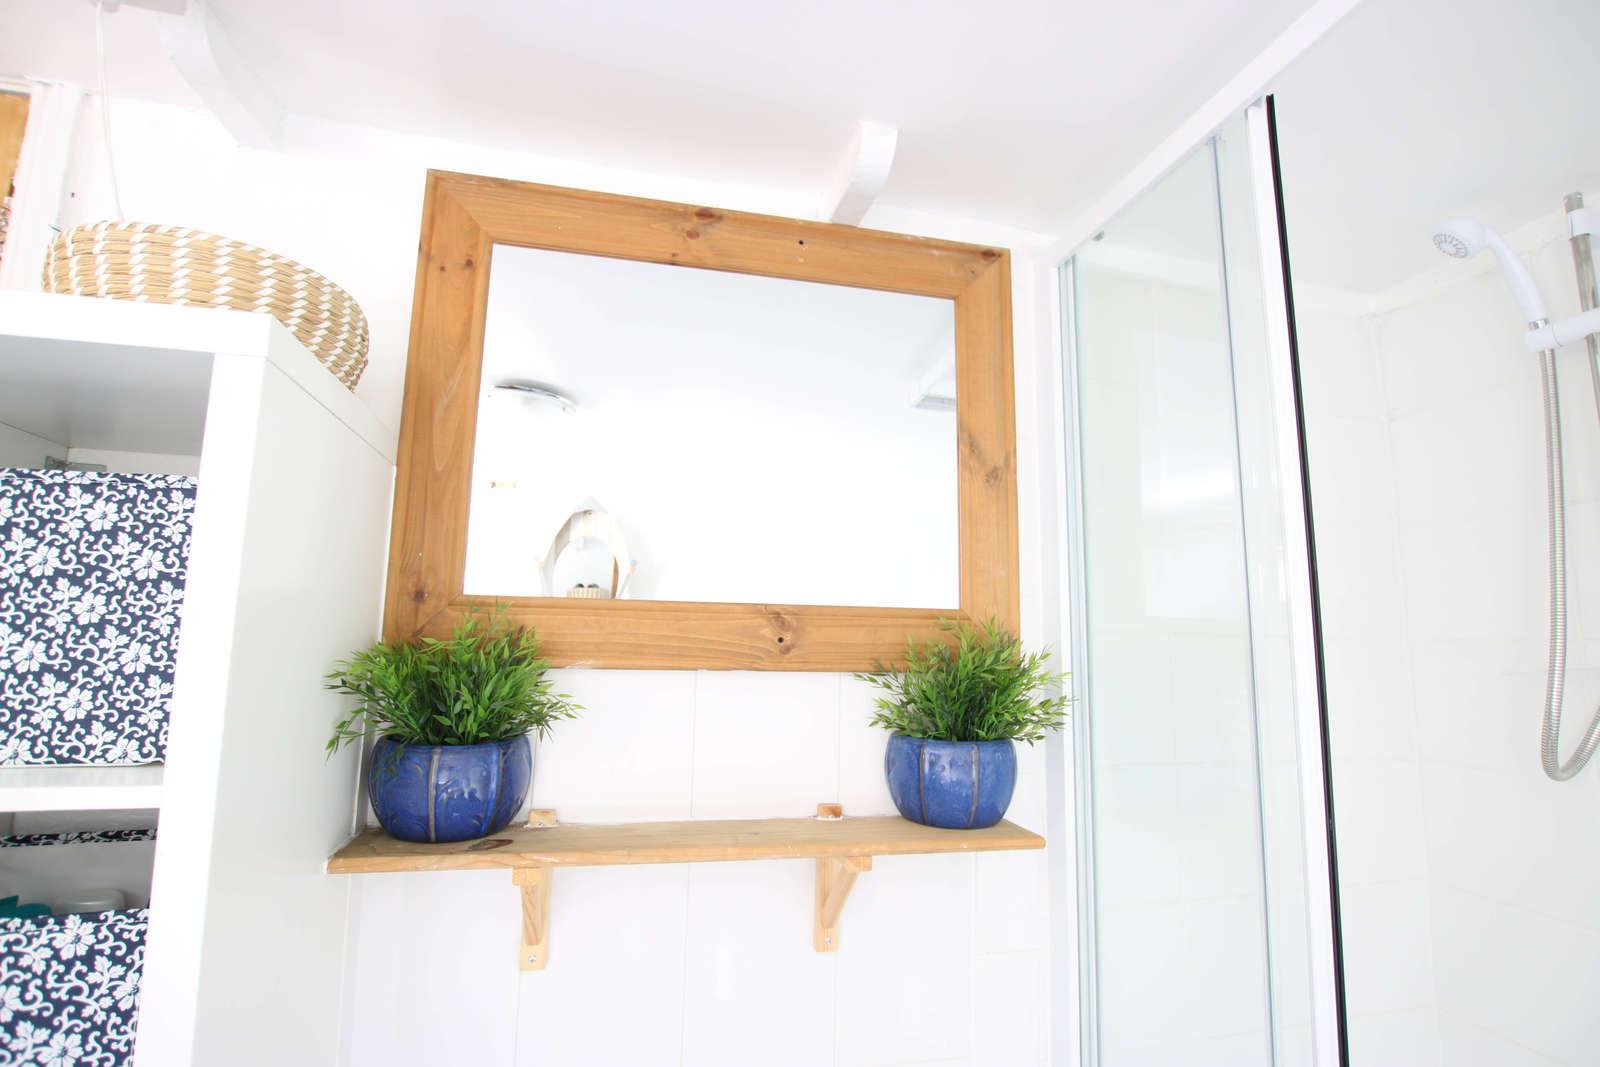 image showing bathroom mirror detail 001